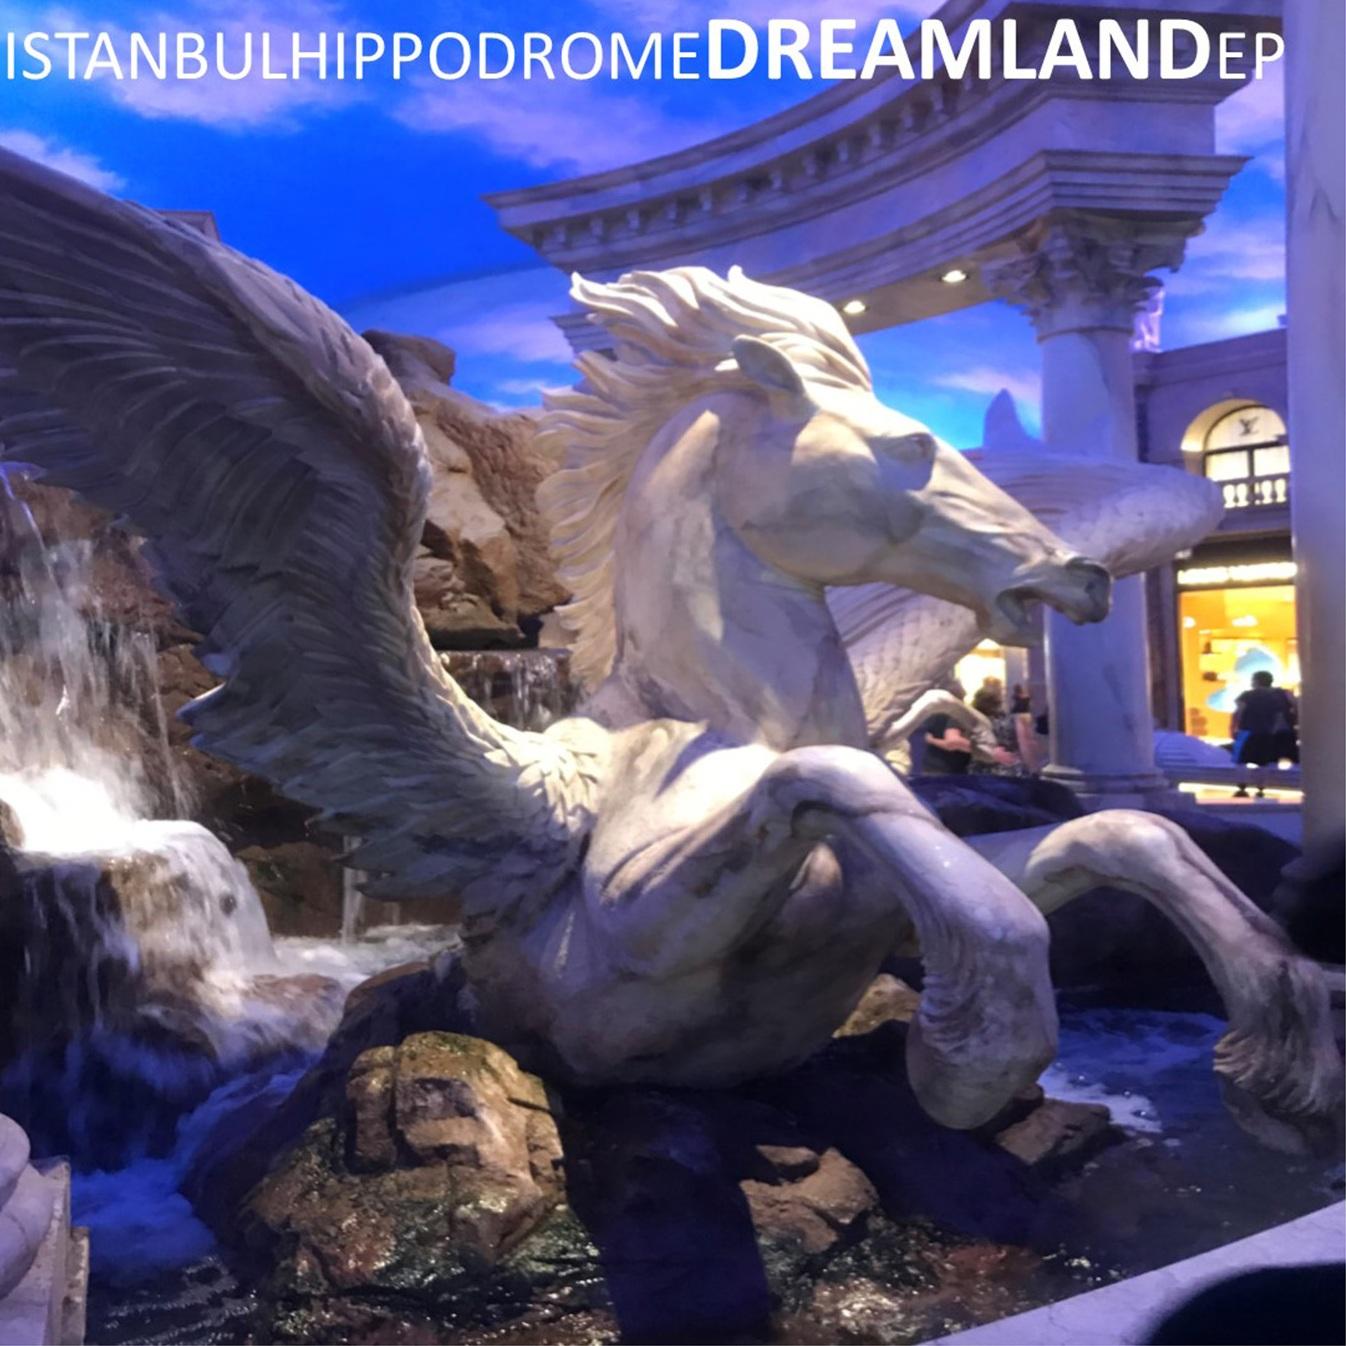 DREAMLAND+1400.jpg